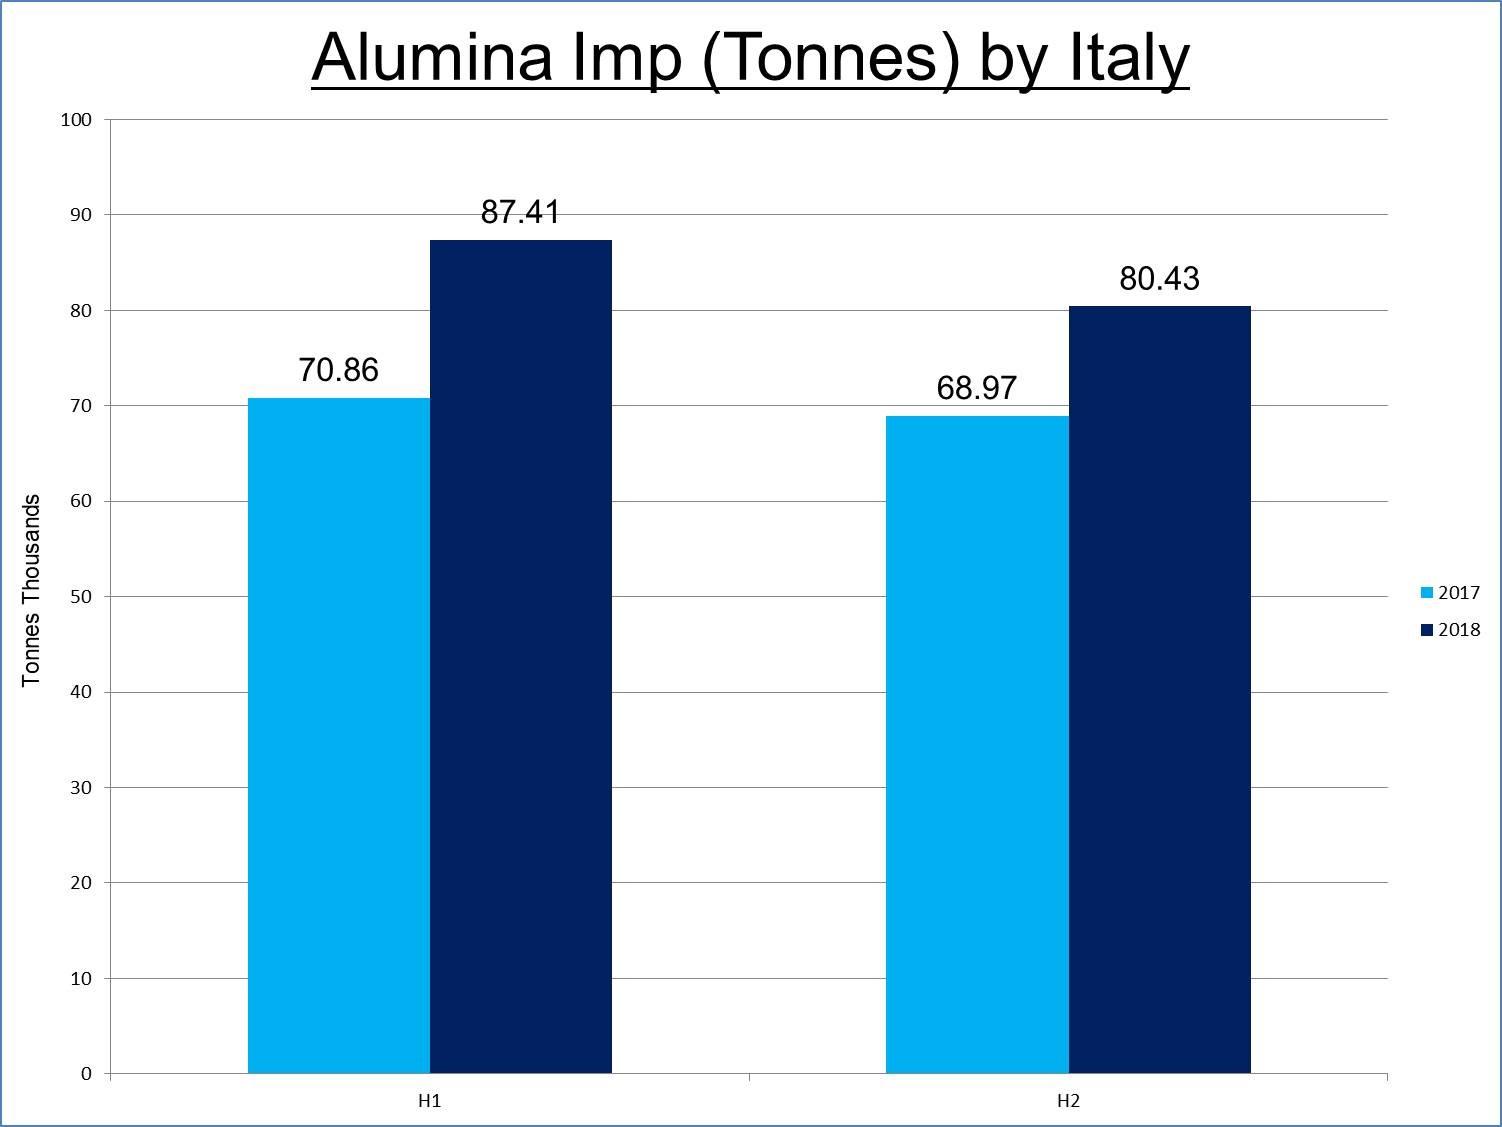 Italy's imports of alumina to rise 23% in H1 2018